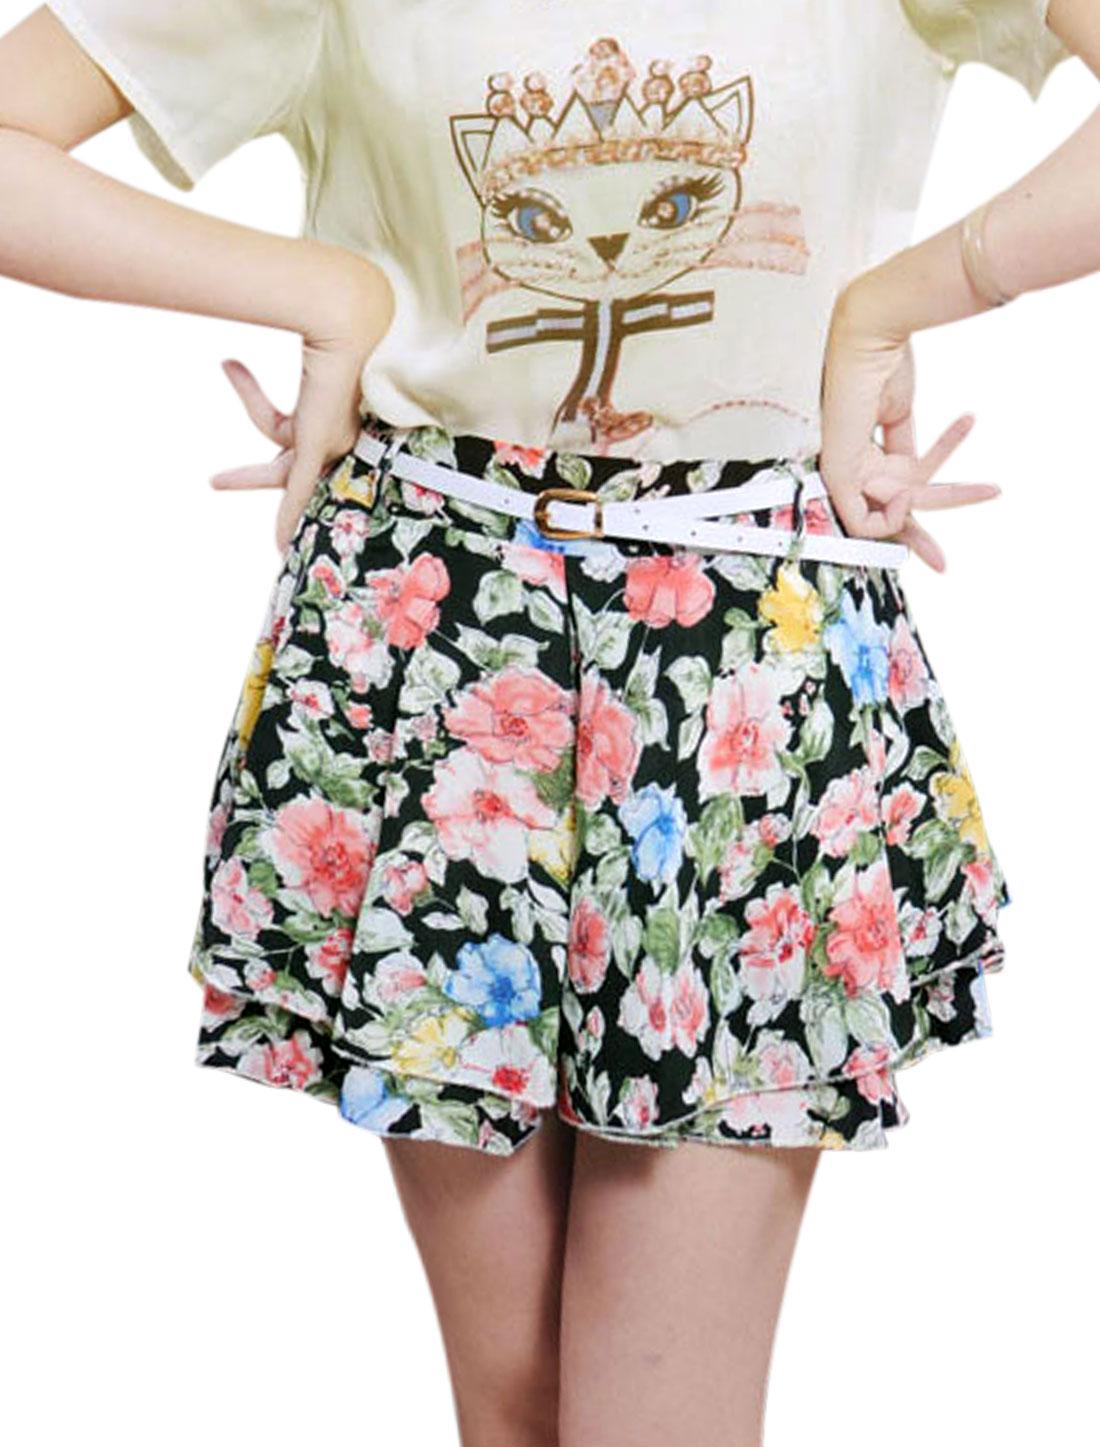 Lady Floral Prints Tiered Design Shorts w Belt Black XS